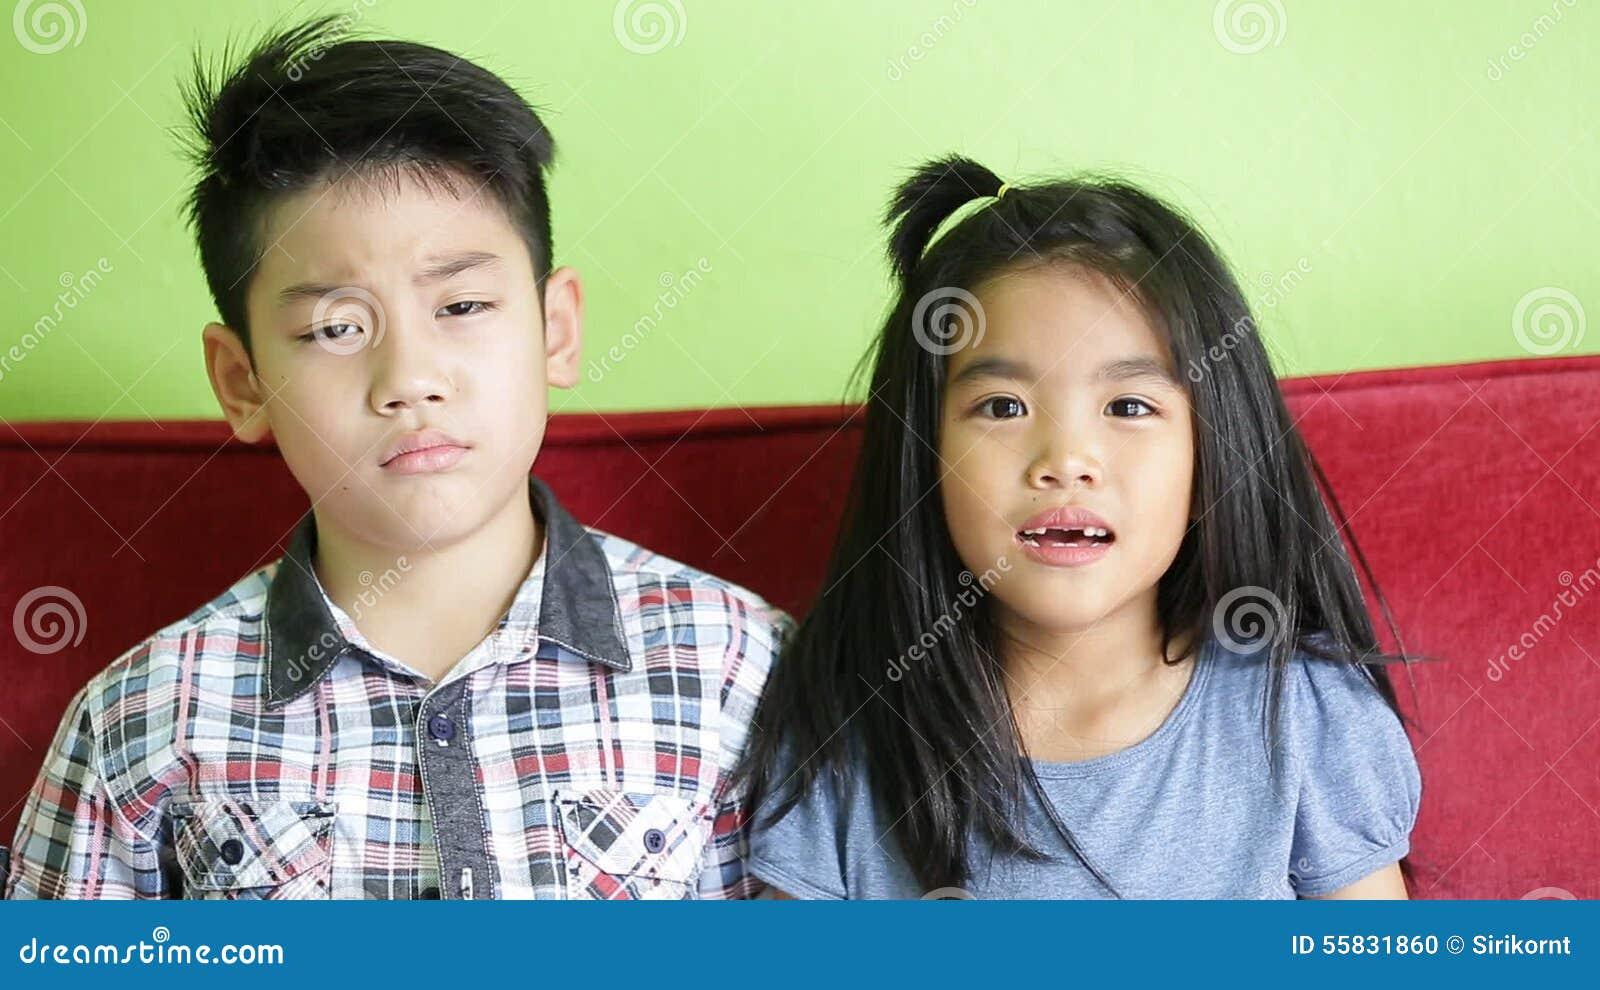 asian-boy-girl